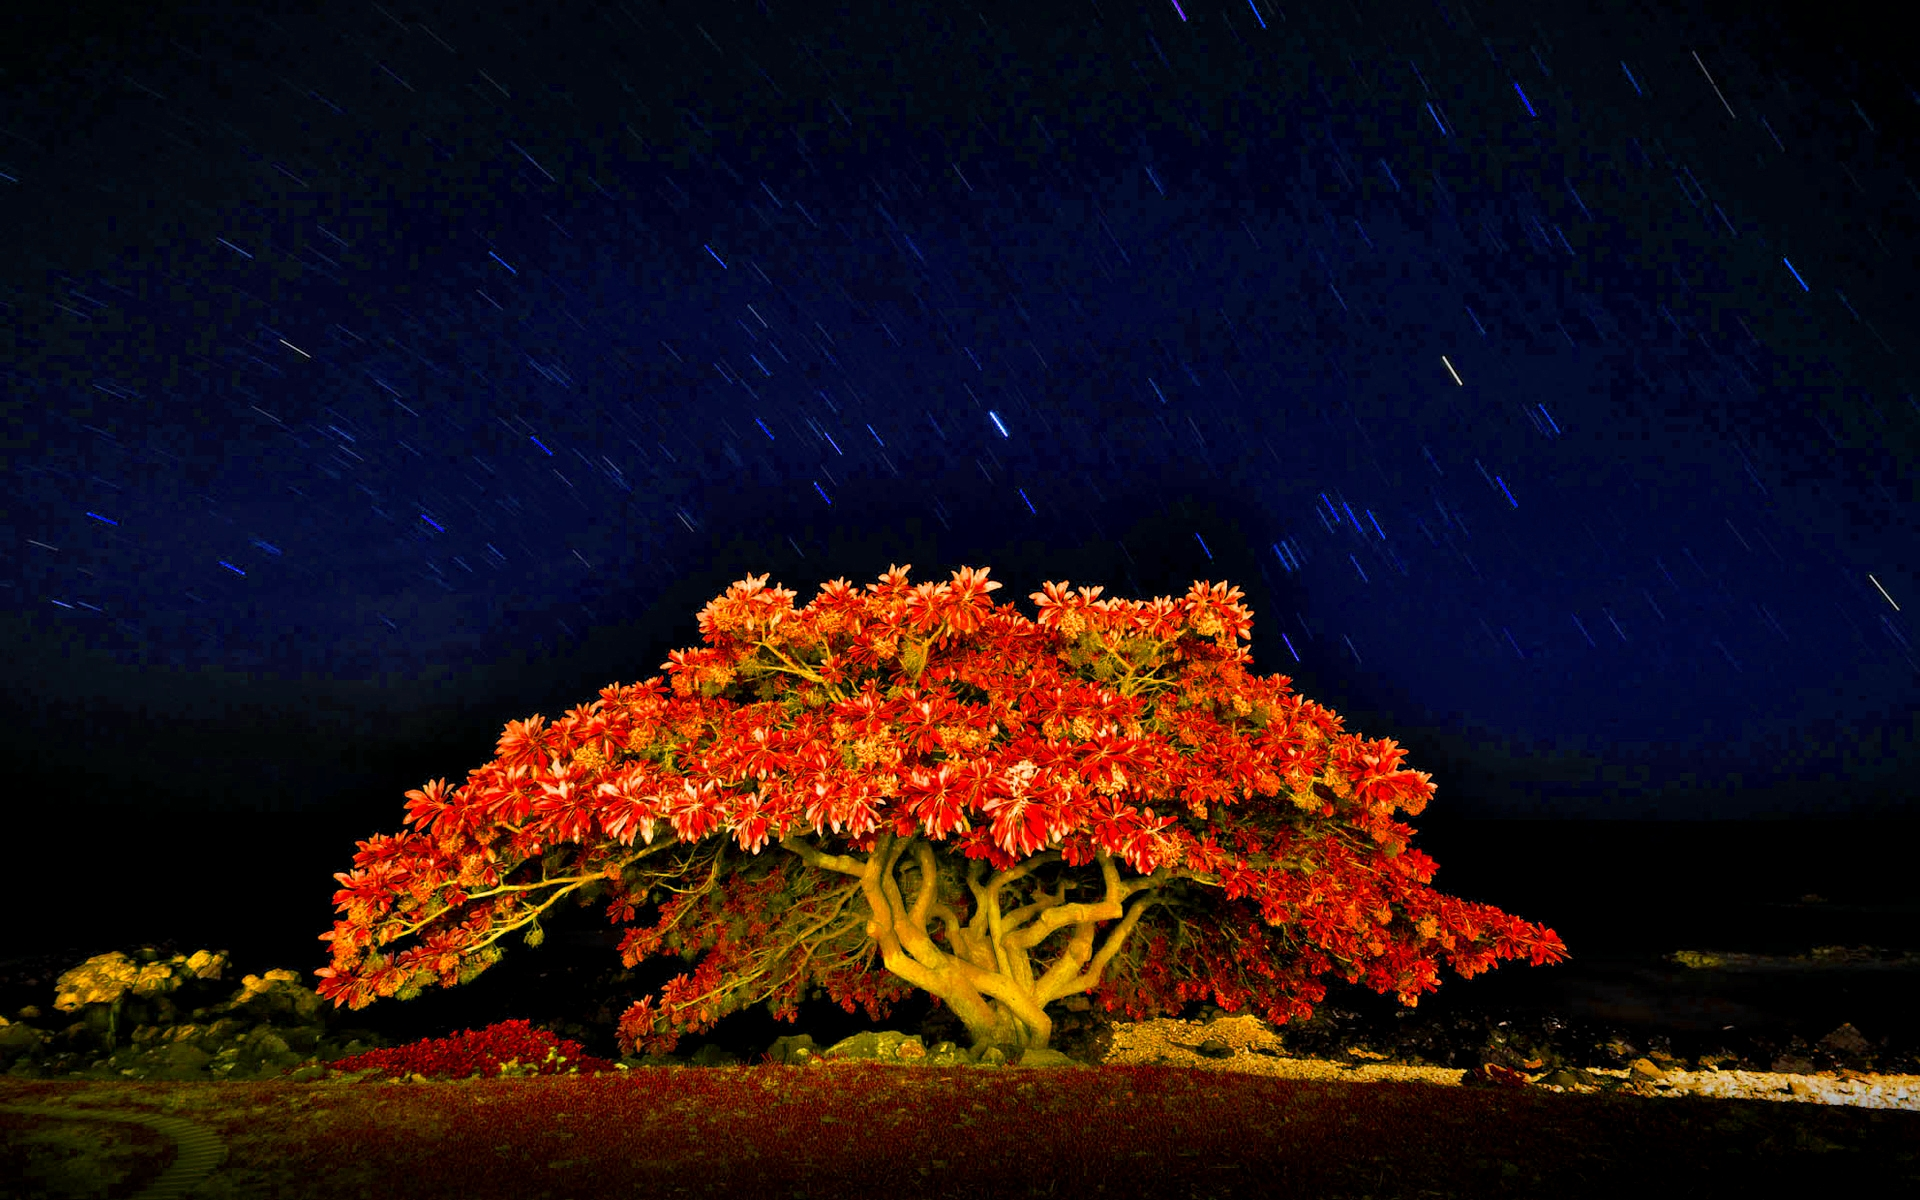 Autumn Meteor Rainfall - Autumn Meteor Rainfall